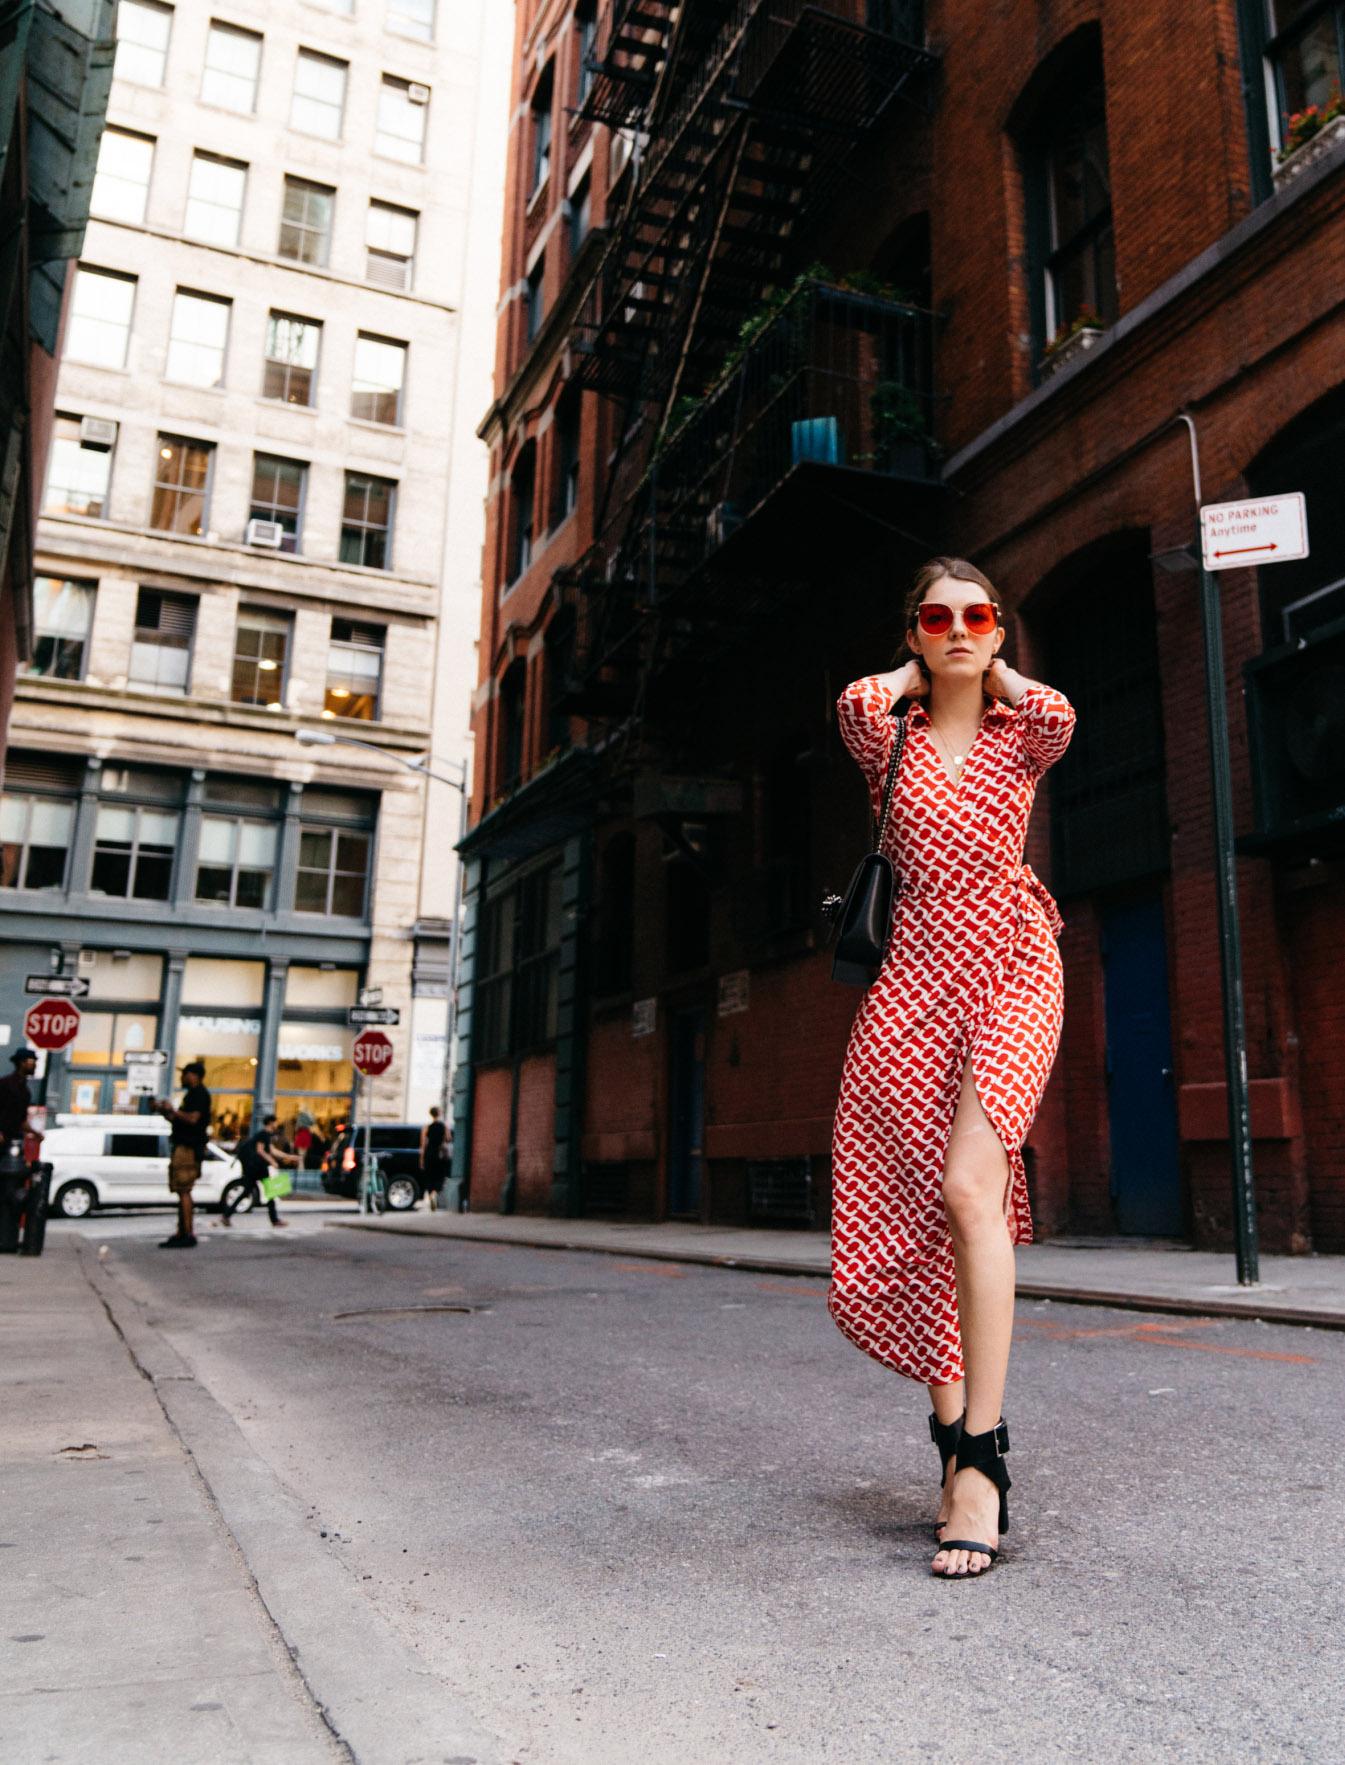 laparvenue-fashion-blog-paris-new-york-raphaelle-leboeuf-soho-zaful-wrap-dress-christian-louboutin-black-bag-outfitdhl08534